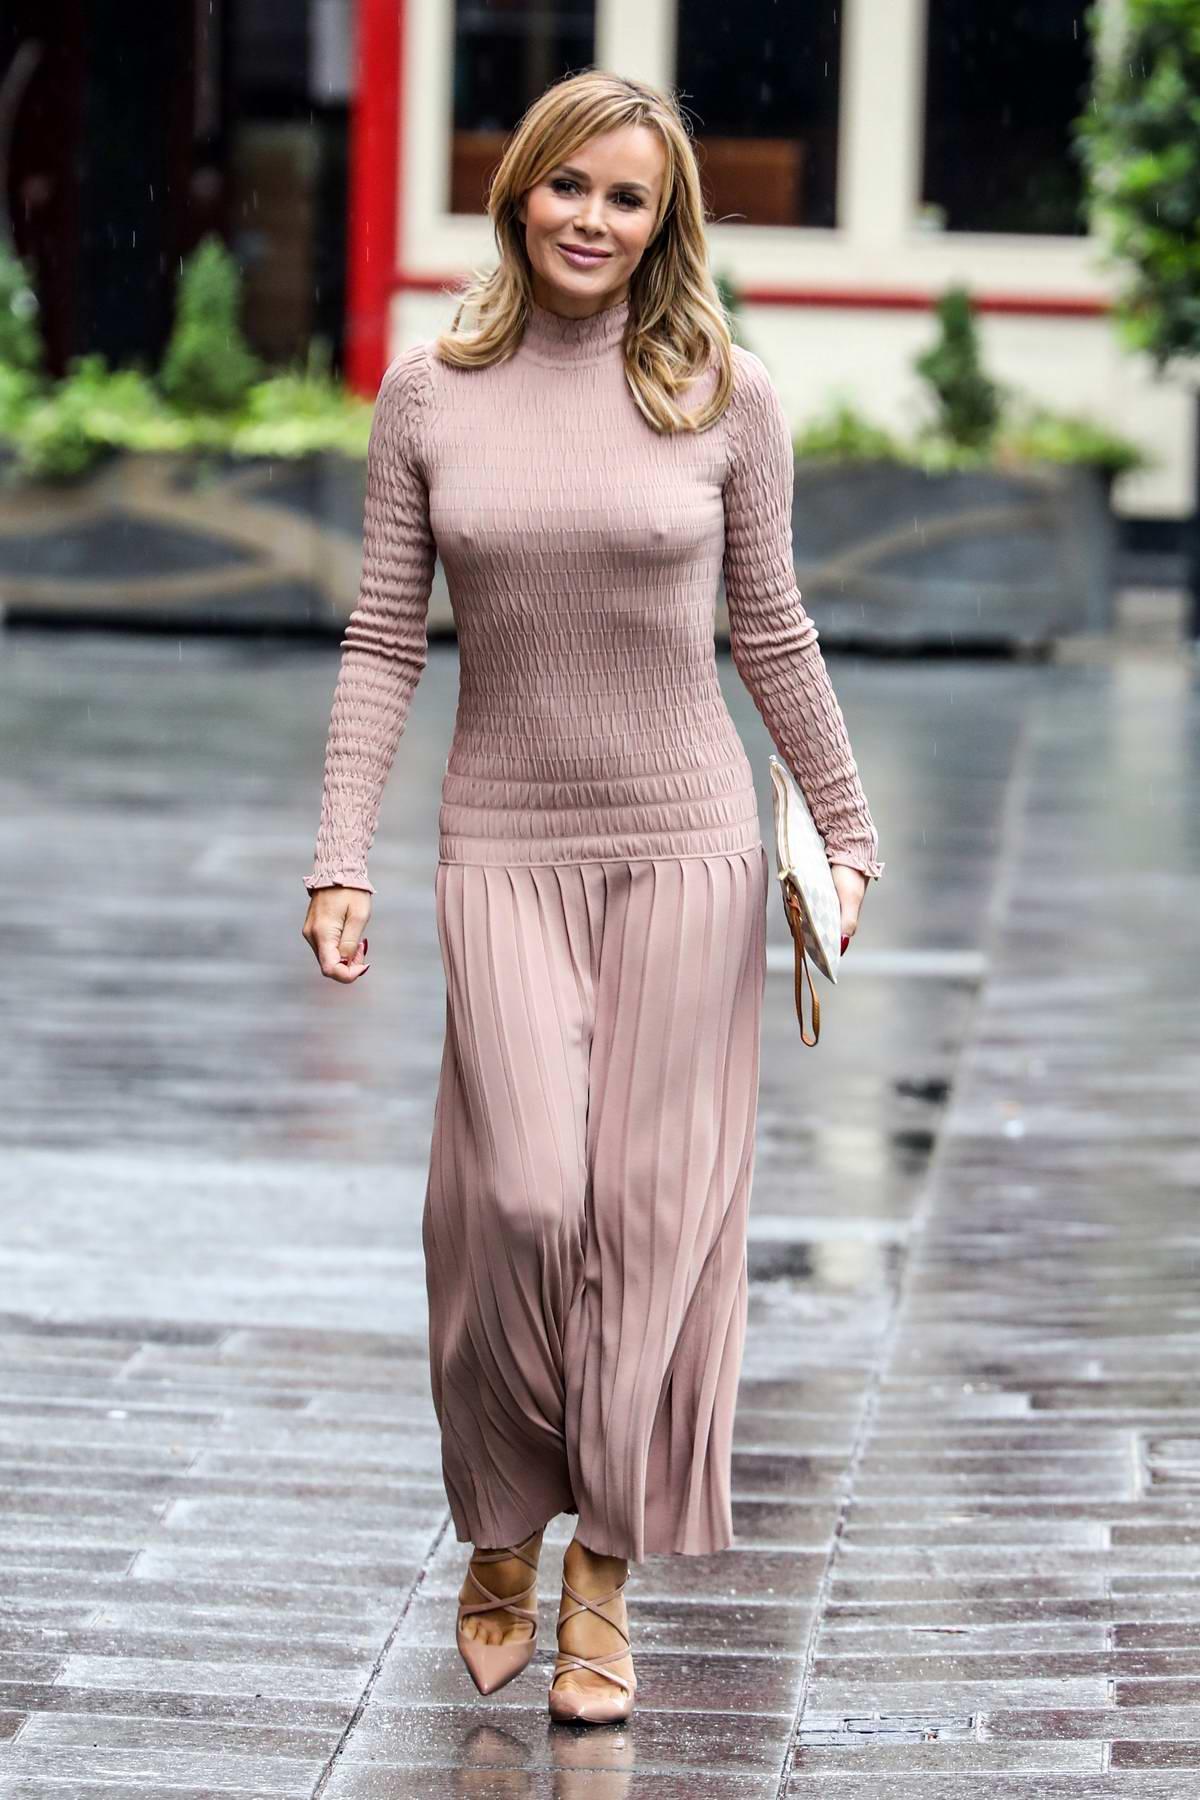 Amanda Holden seen wearing a form-fitting light mauve dress she leaves the Global Radio Studios in London, UK